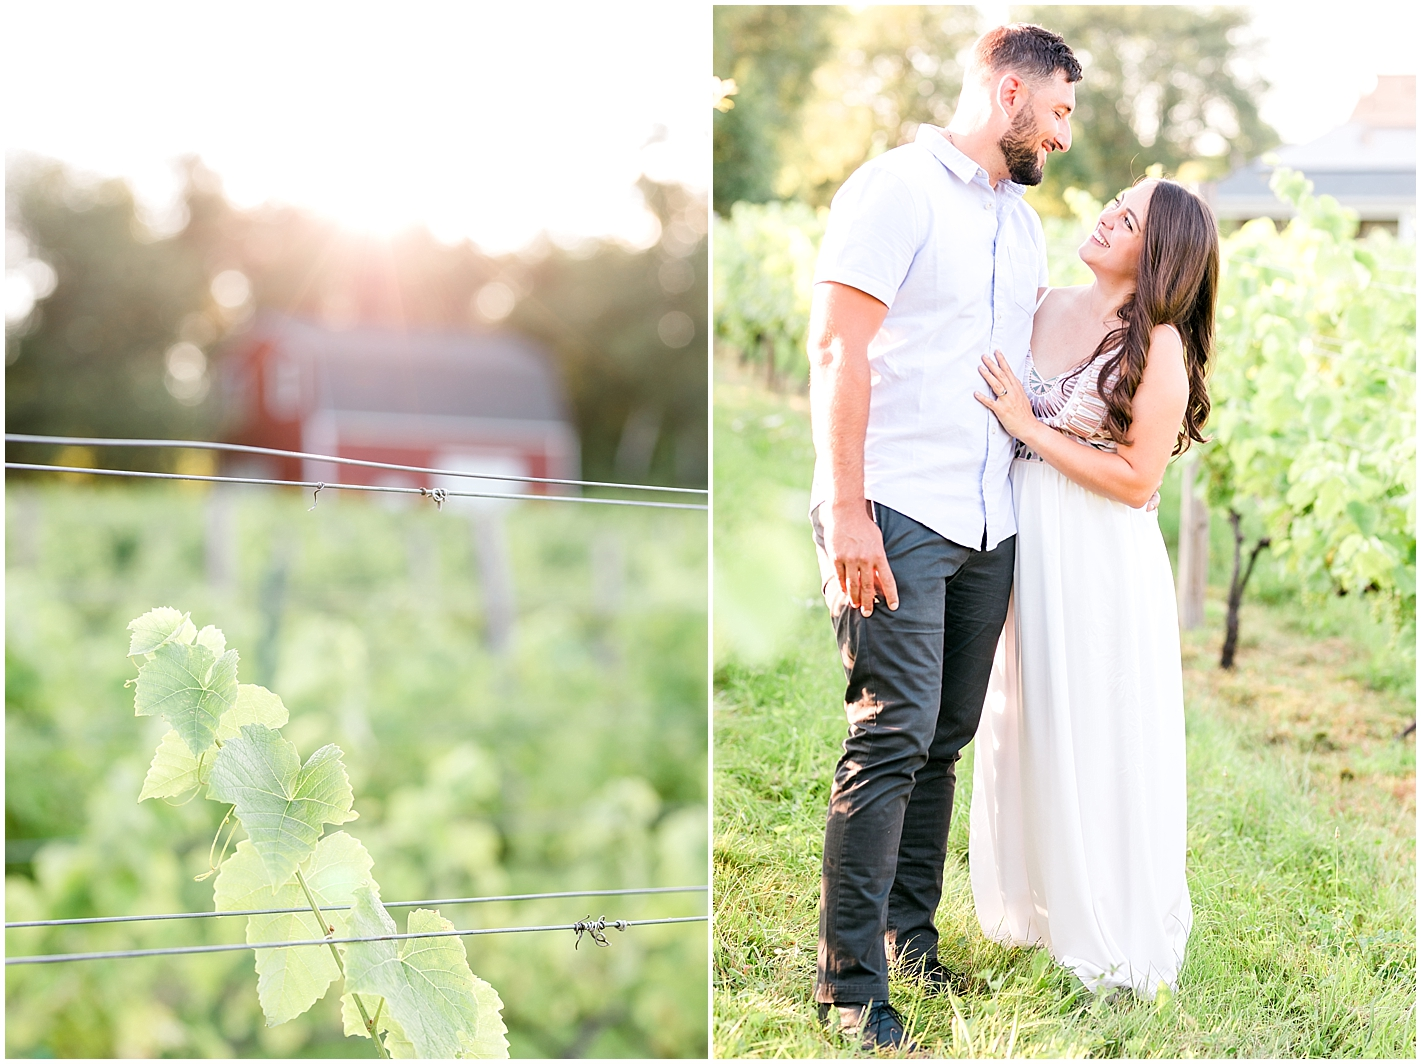 Engagement photos Broken Creek Vineyard in Shrewsbury MA by Alyssa Parker Photography